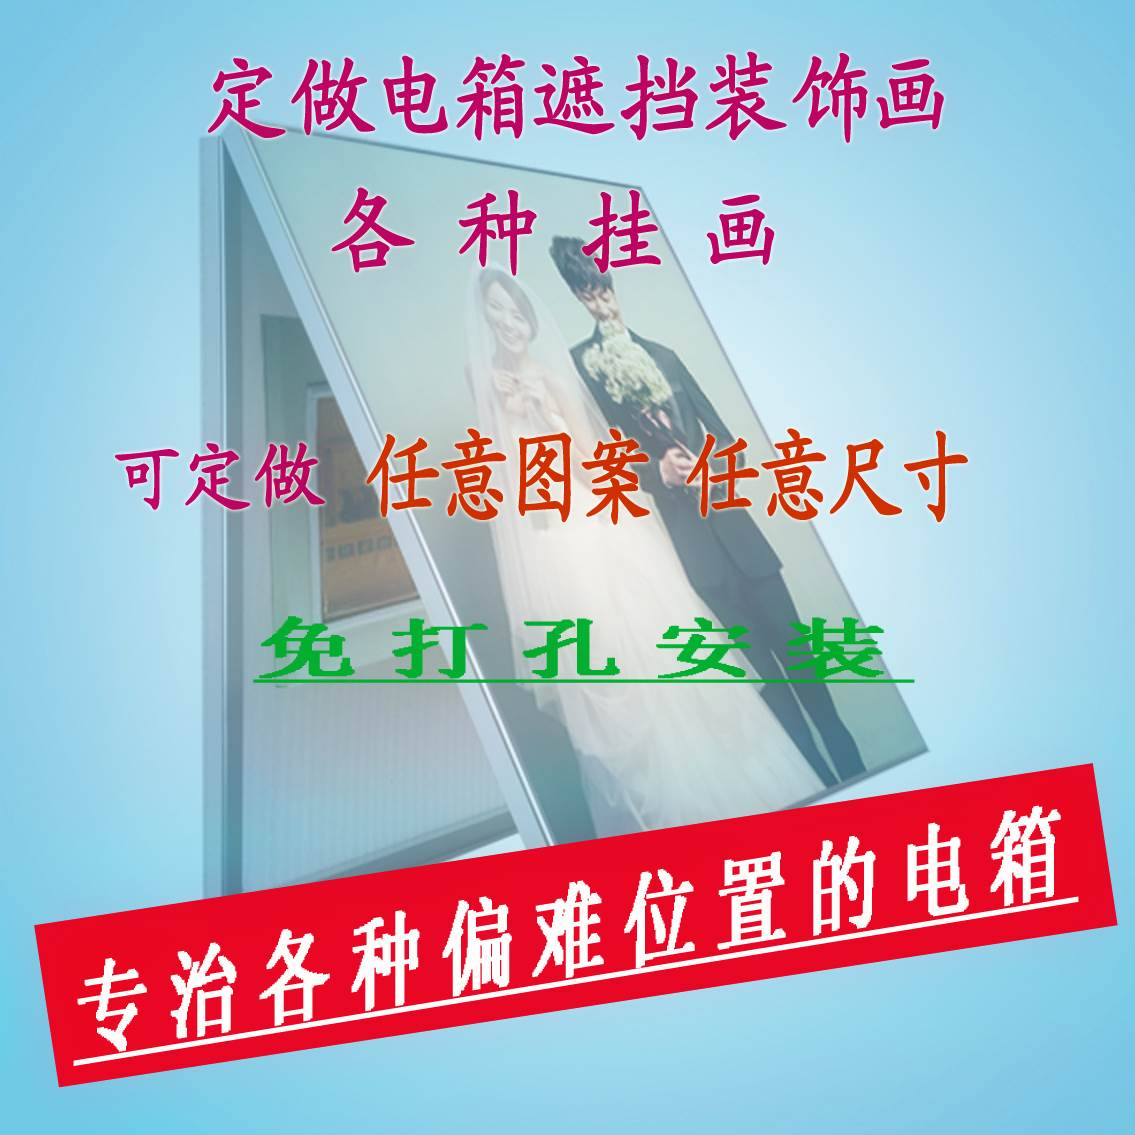 Китайская живопись Артикул 638847522049